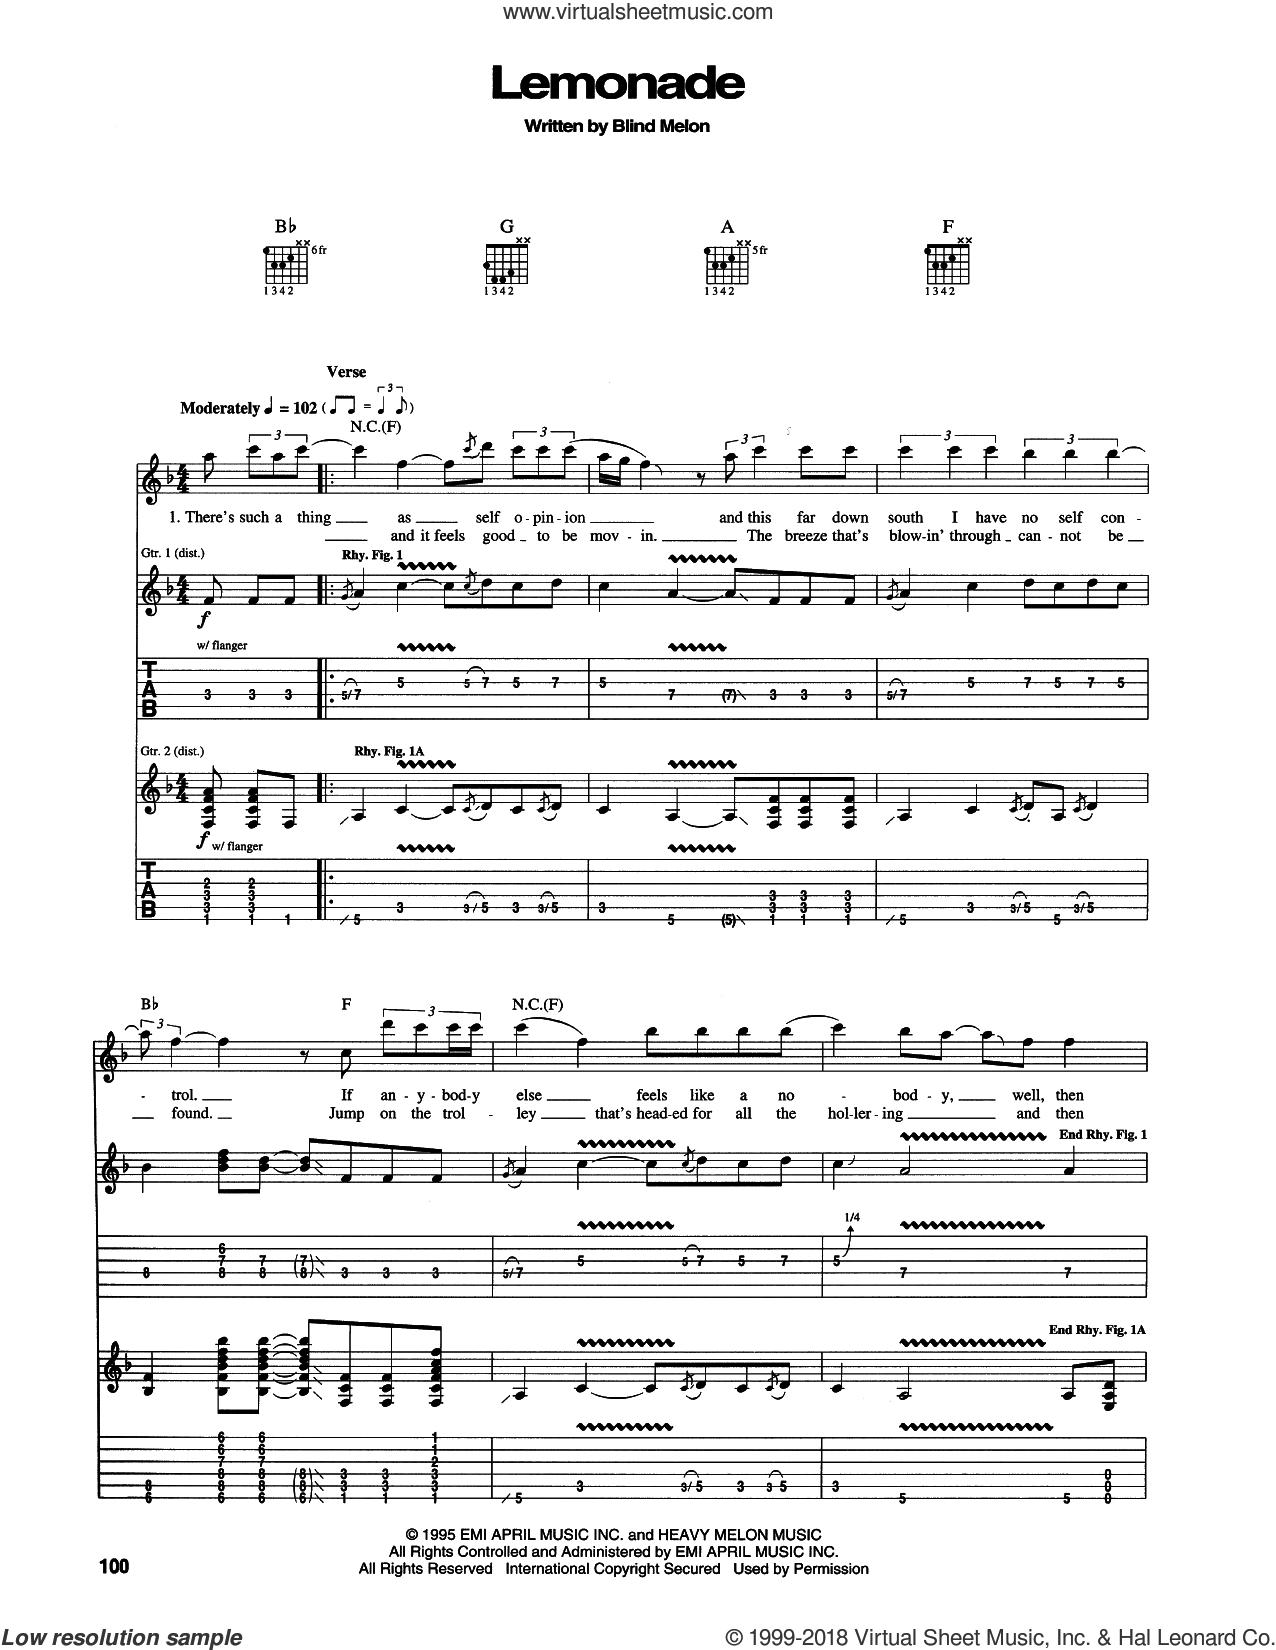 Lemonade sheet music for guitar (tablature) by Blind Melon, intermediate skill level